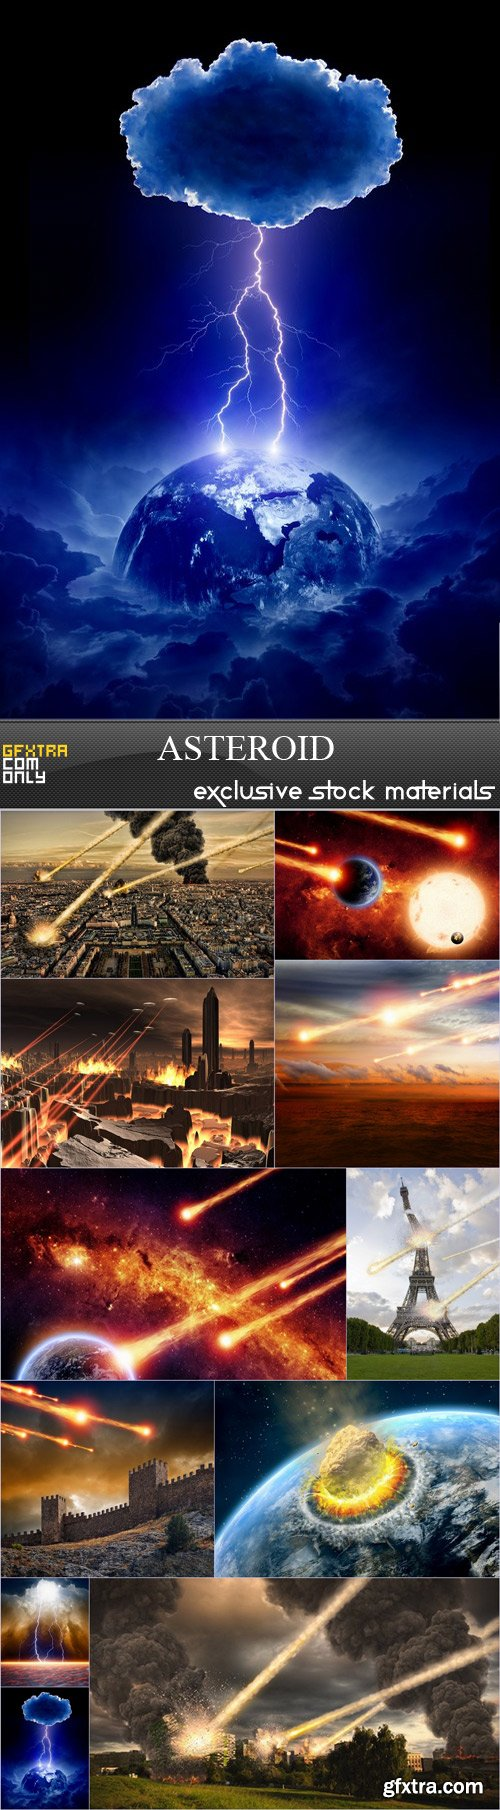 Asteroid - 11 JPRGs